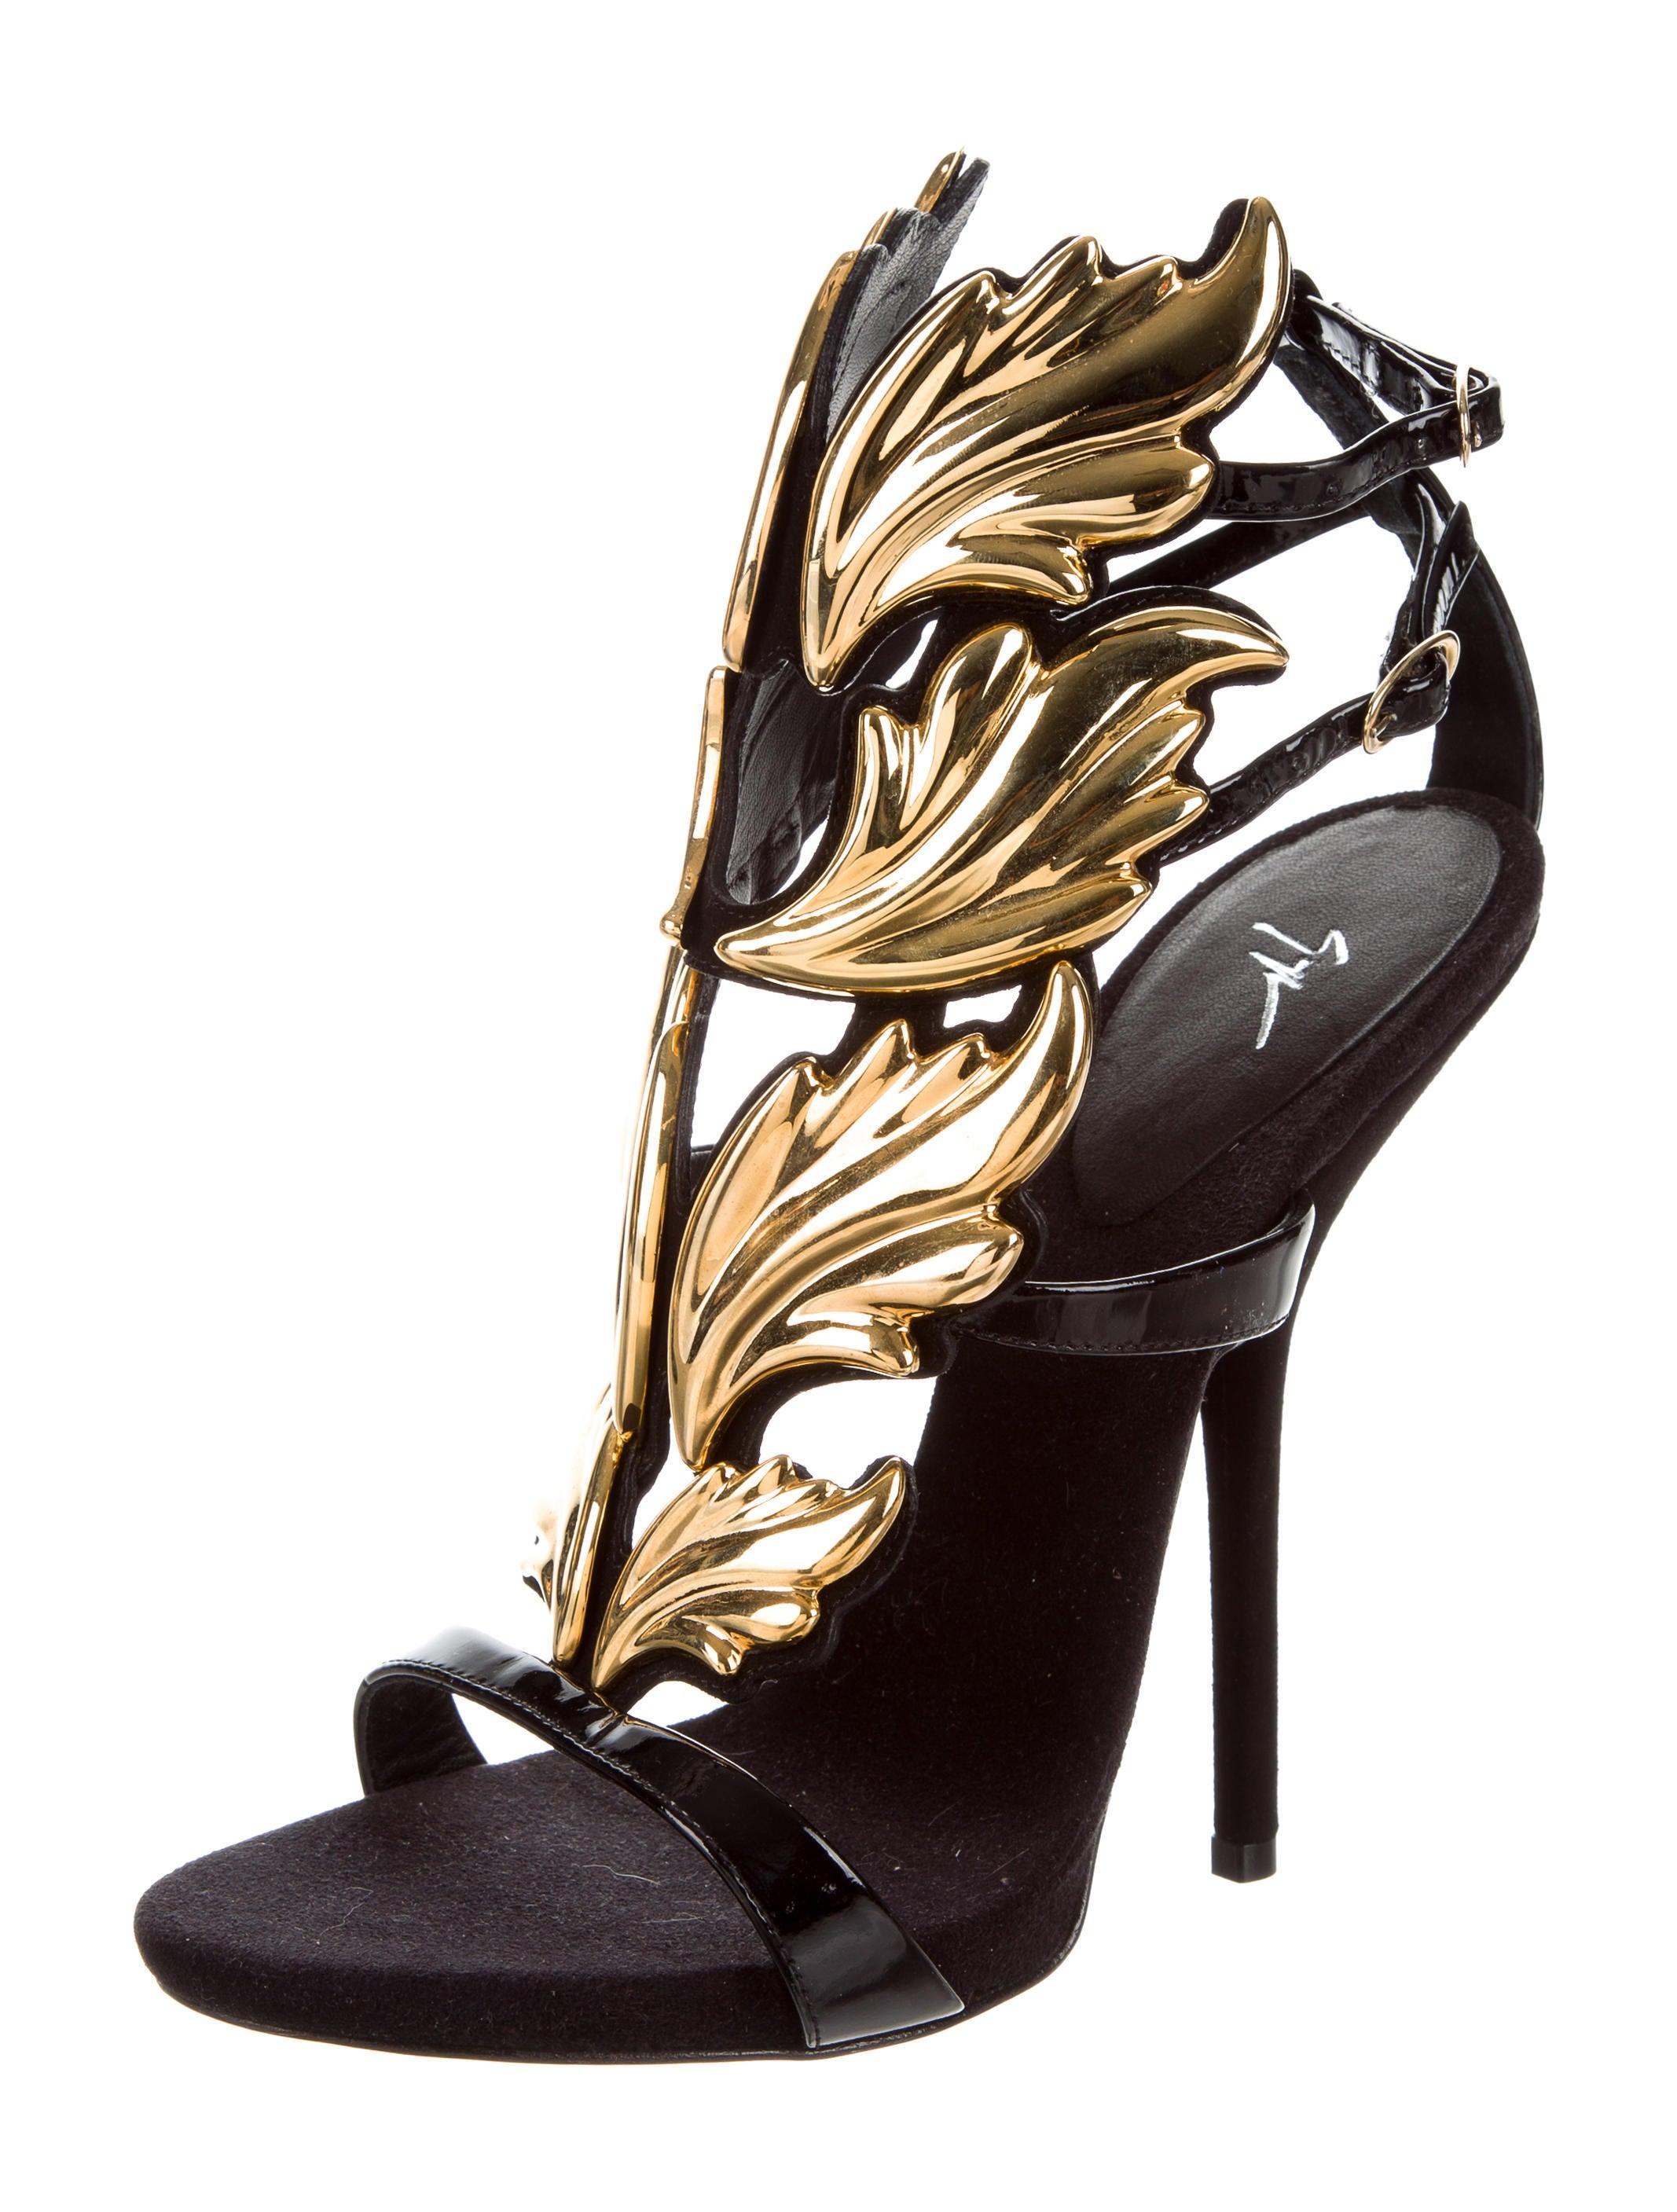 9b9f22ed86149 Zanotti Sandals Sale Price Shoes Cheap   UAE CONSULATE